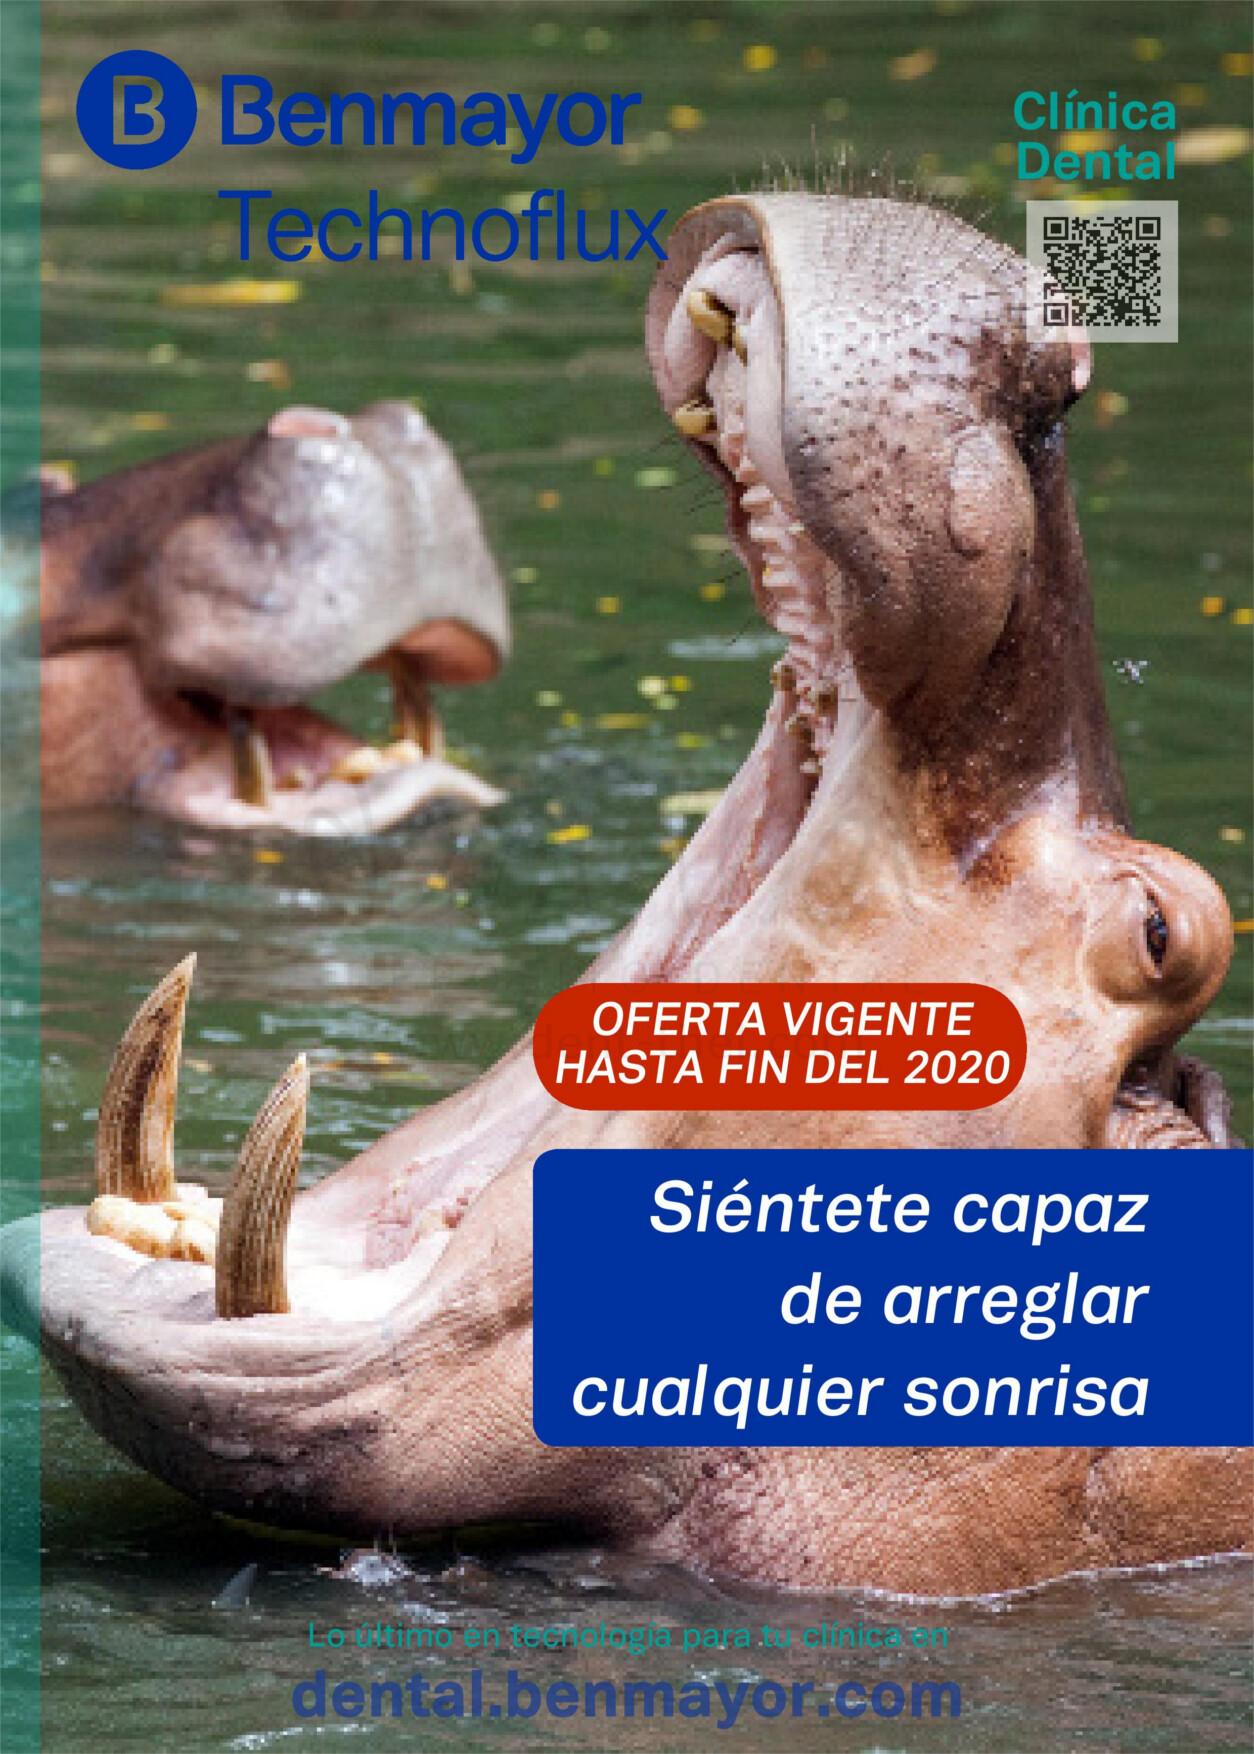 Ofertas Benmayor clínica hasta 31/12/2020